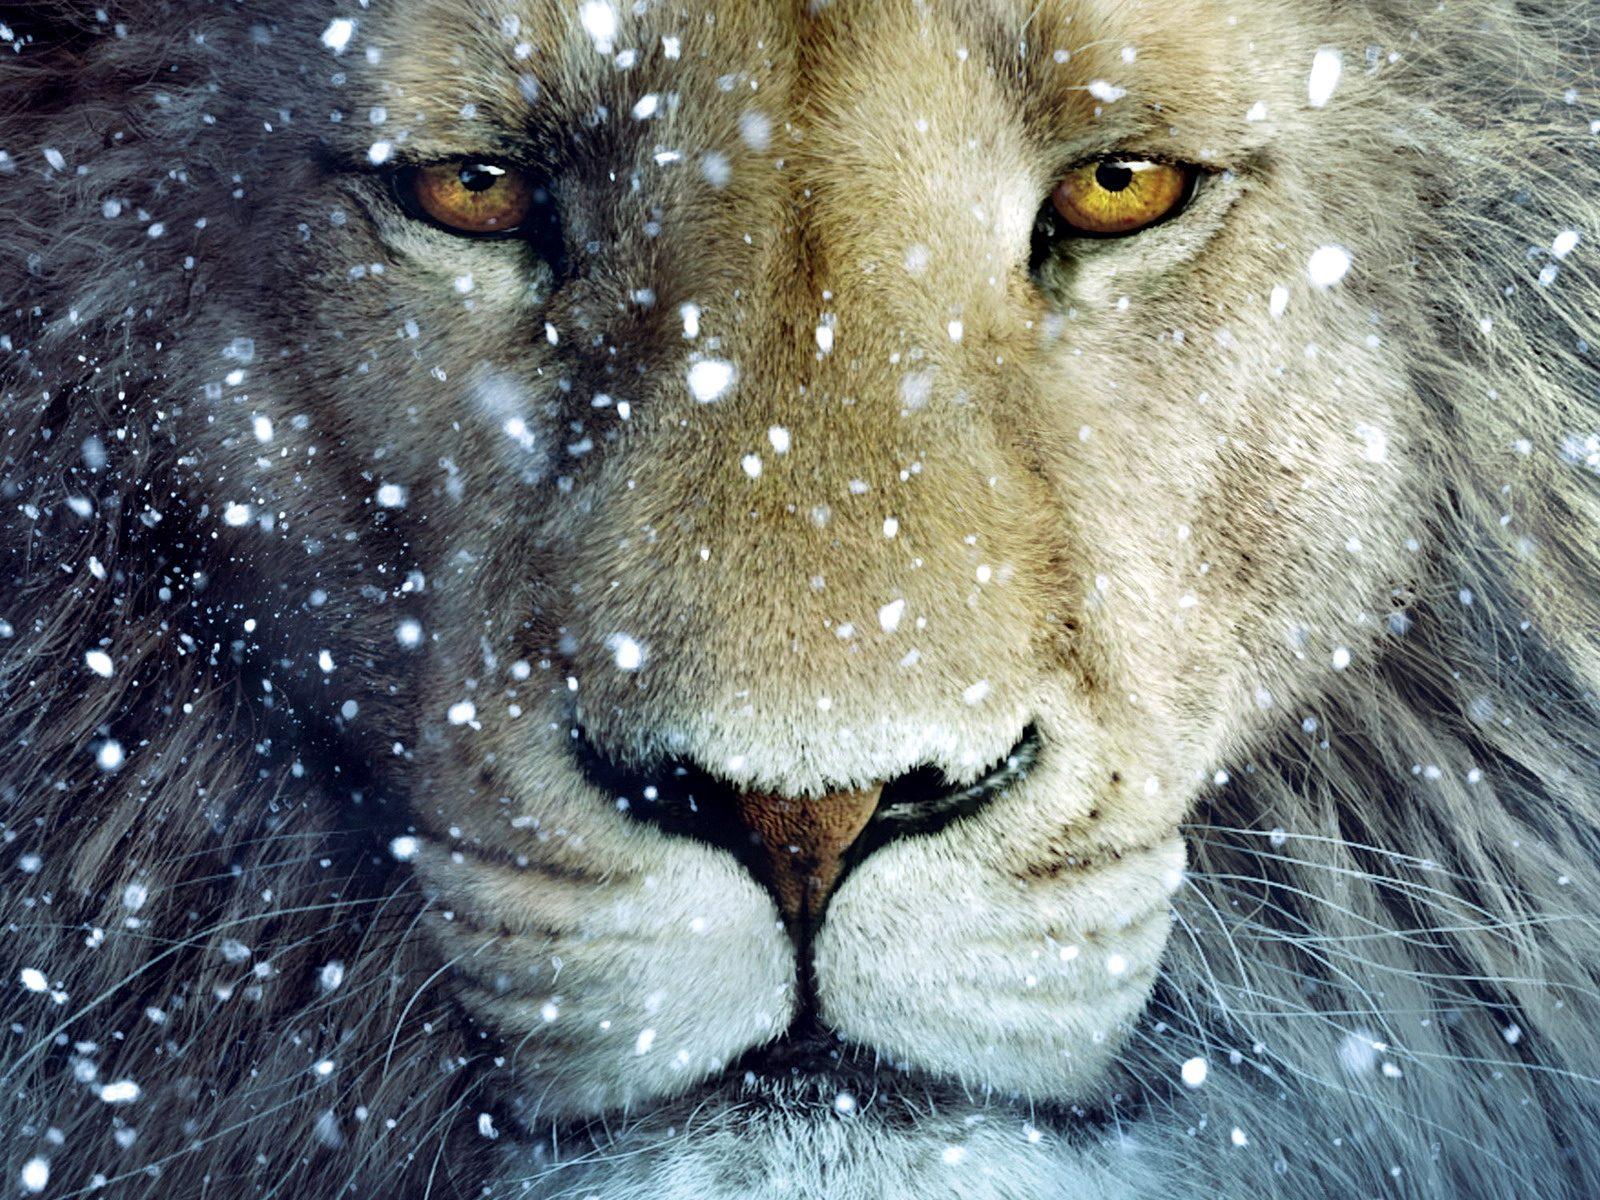 http://2.bp.blogspot.com/-WpVkibjTztE/TptdjbCTniI/AAAAAAAAAl8/QcNzaUIOtpQ/s1600/Lion%2520wallpapers%2520for%2520ipad.jpg